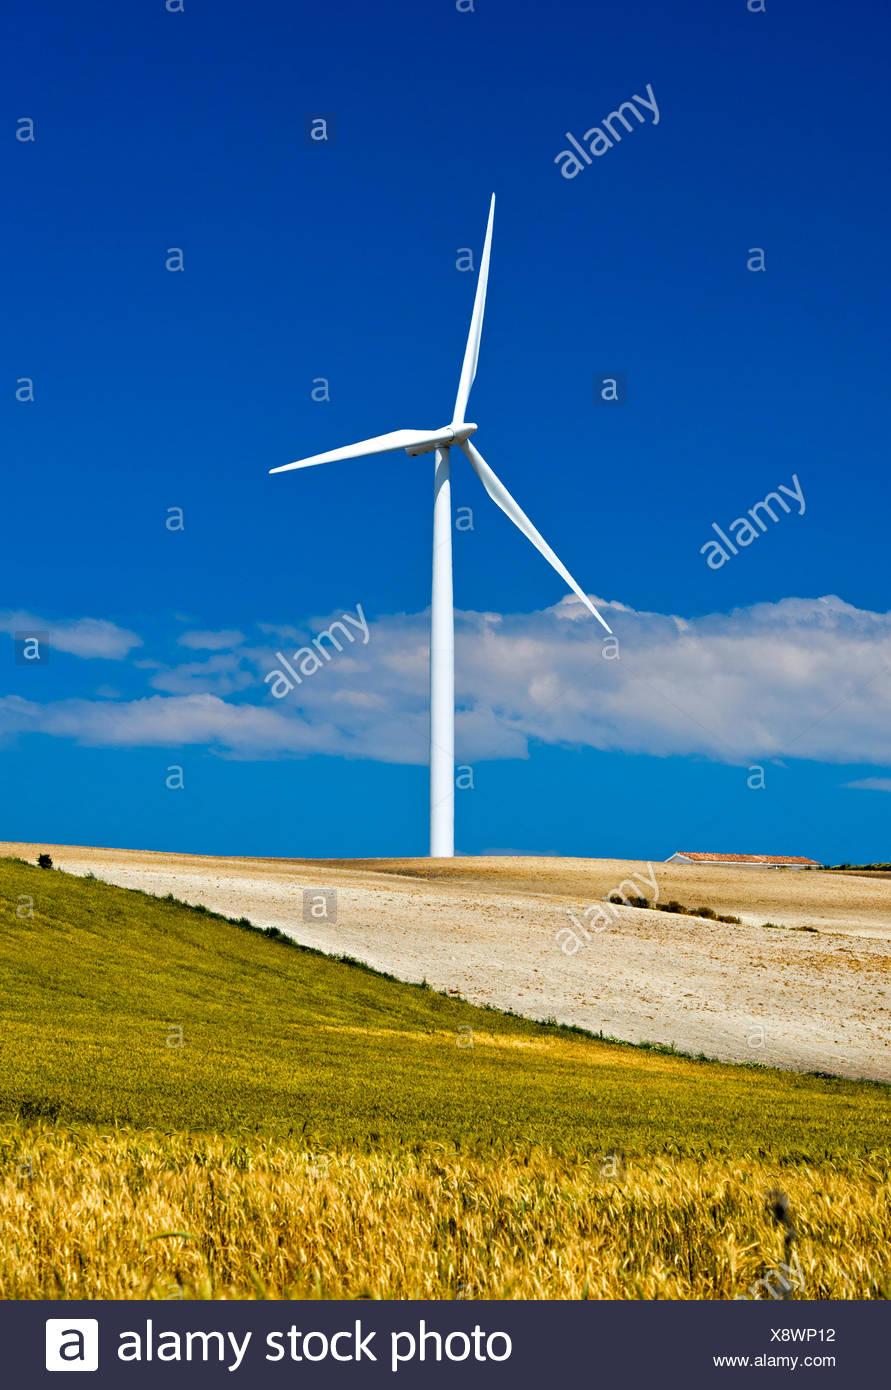 Windkraftanlage, Jerez De La Frontera, Andalusien, Spanien Stockbild